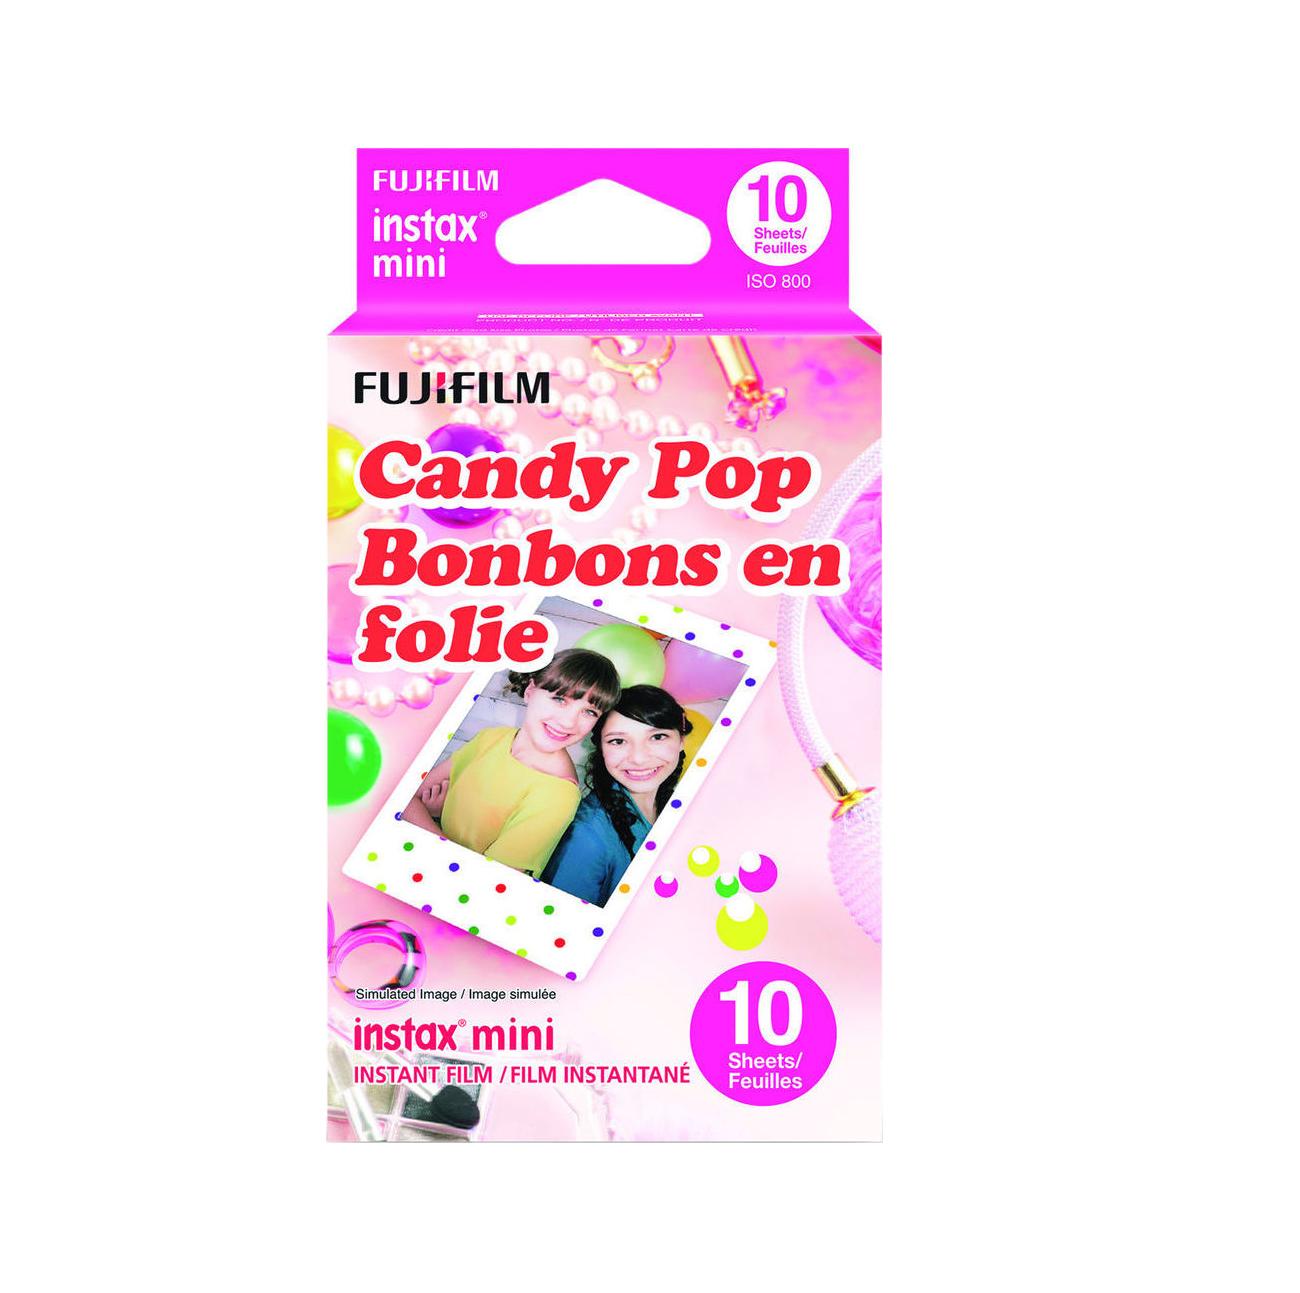 Fujifilm Instax Mini Candy Pop (10 Exposures) New 70100139614 Φιλμ